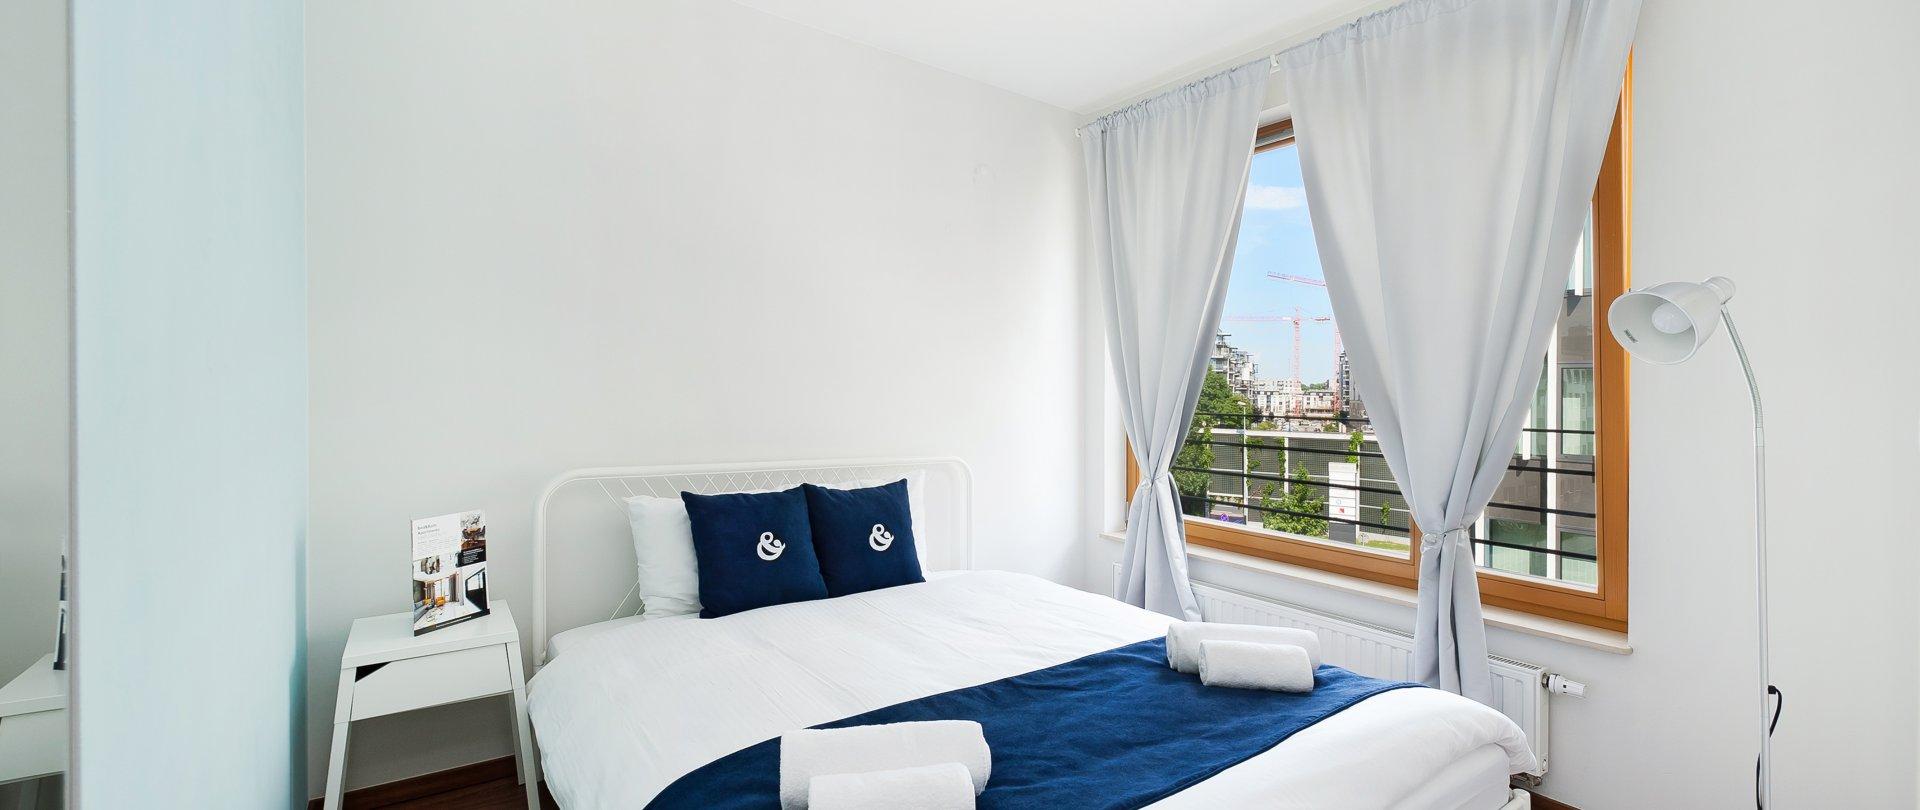 Apartament z 2 sypialniami (1377)